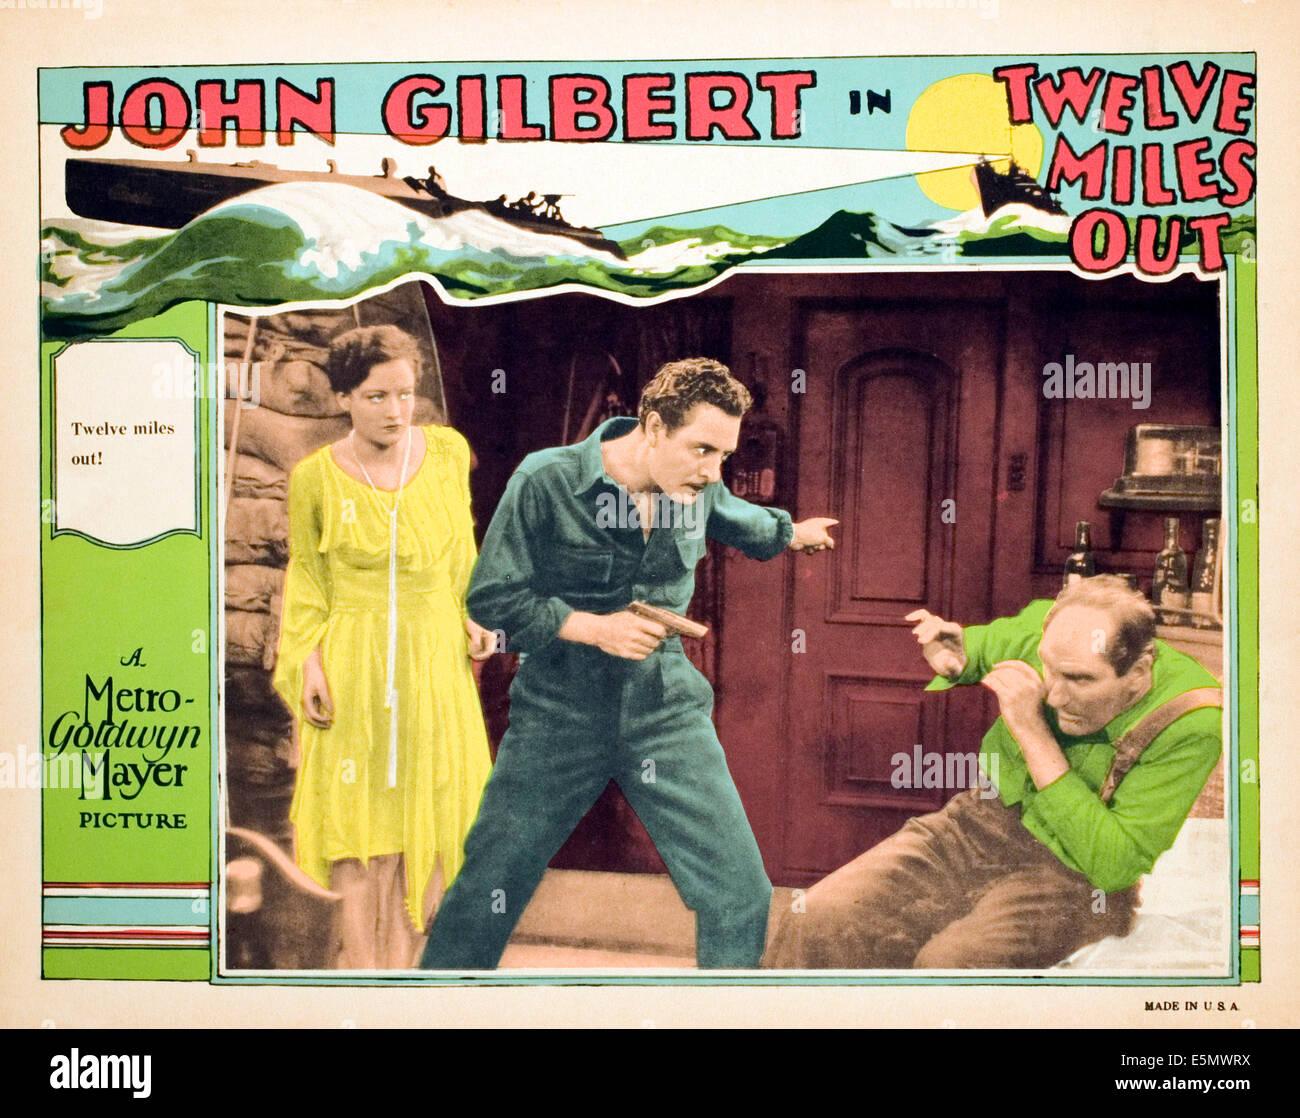 twelve-miles-out-joan-crawford-john-gilb